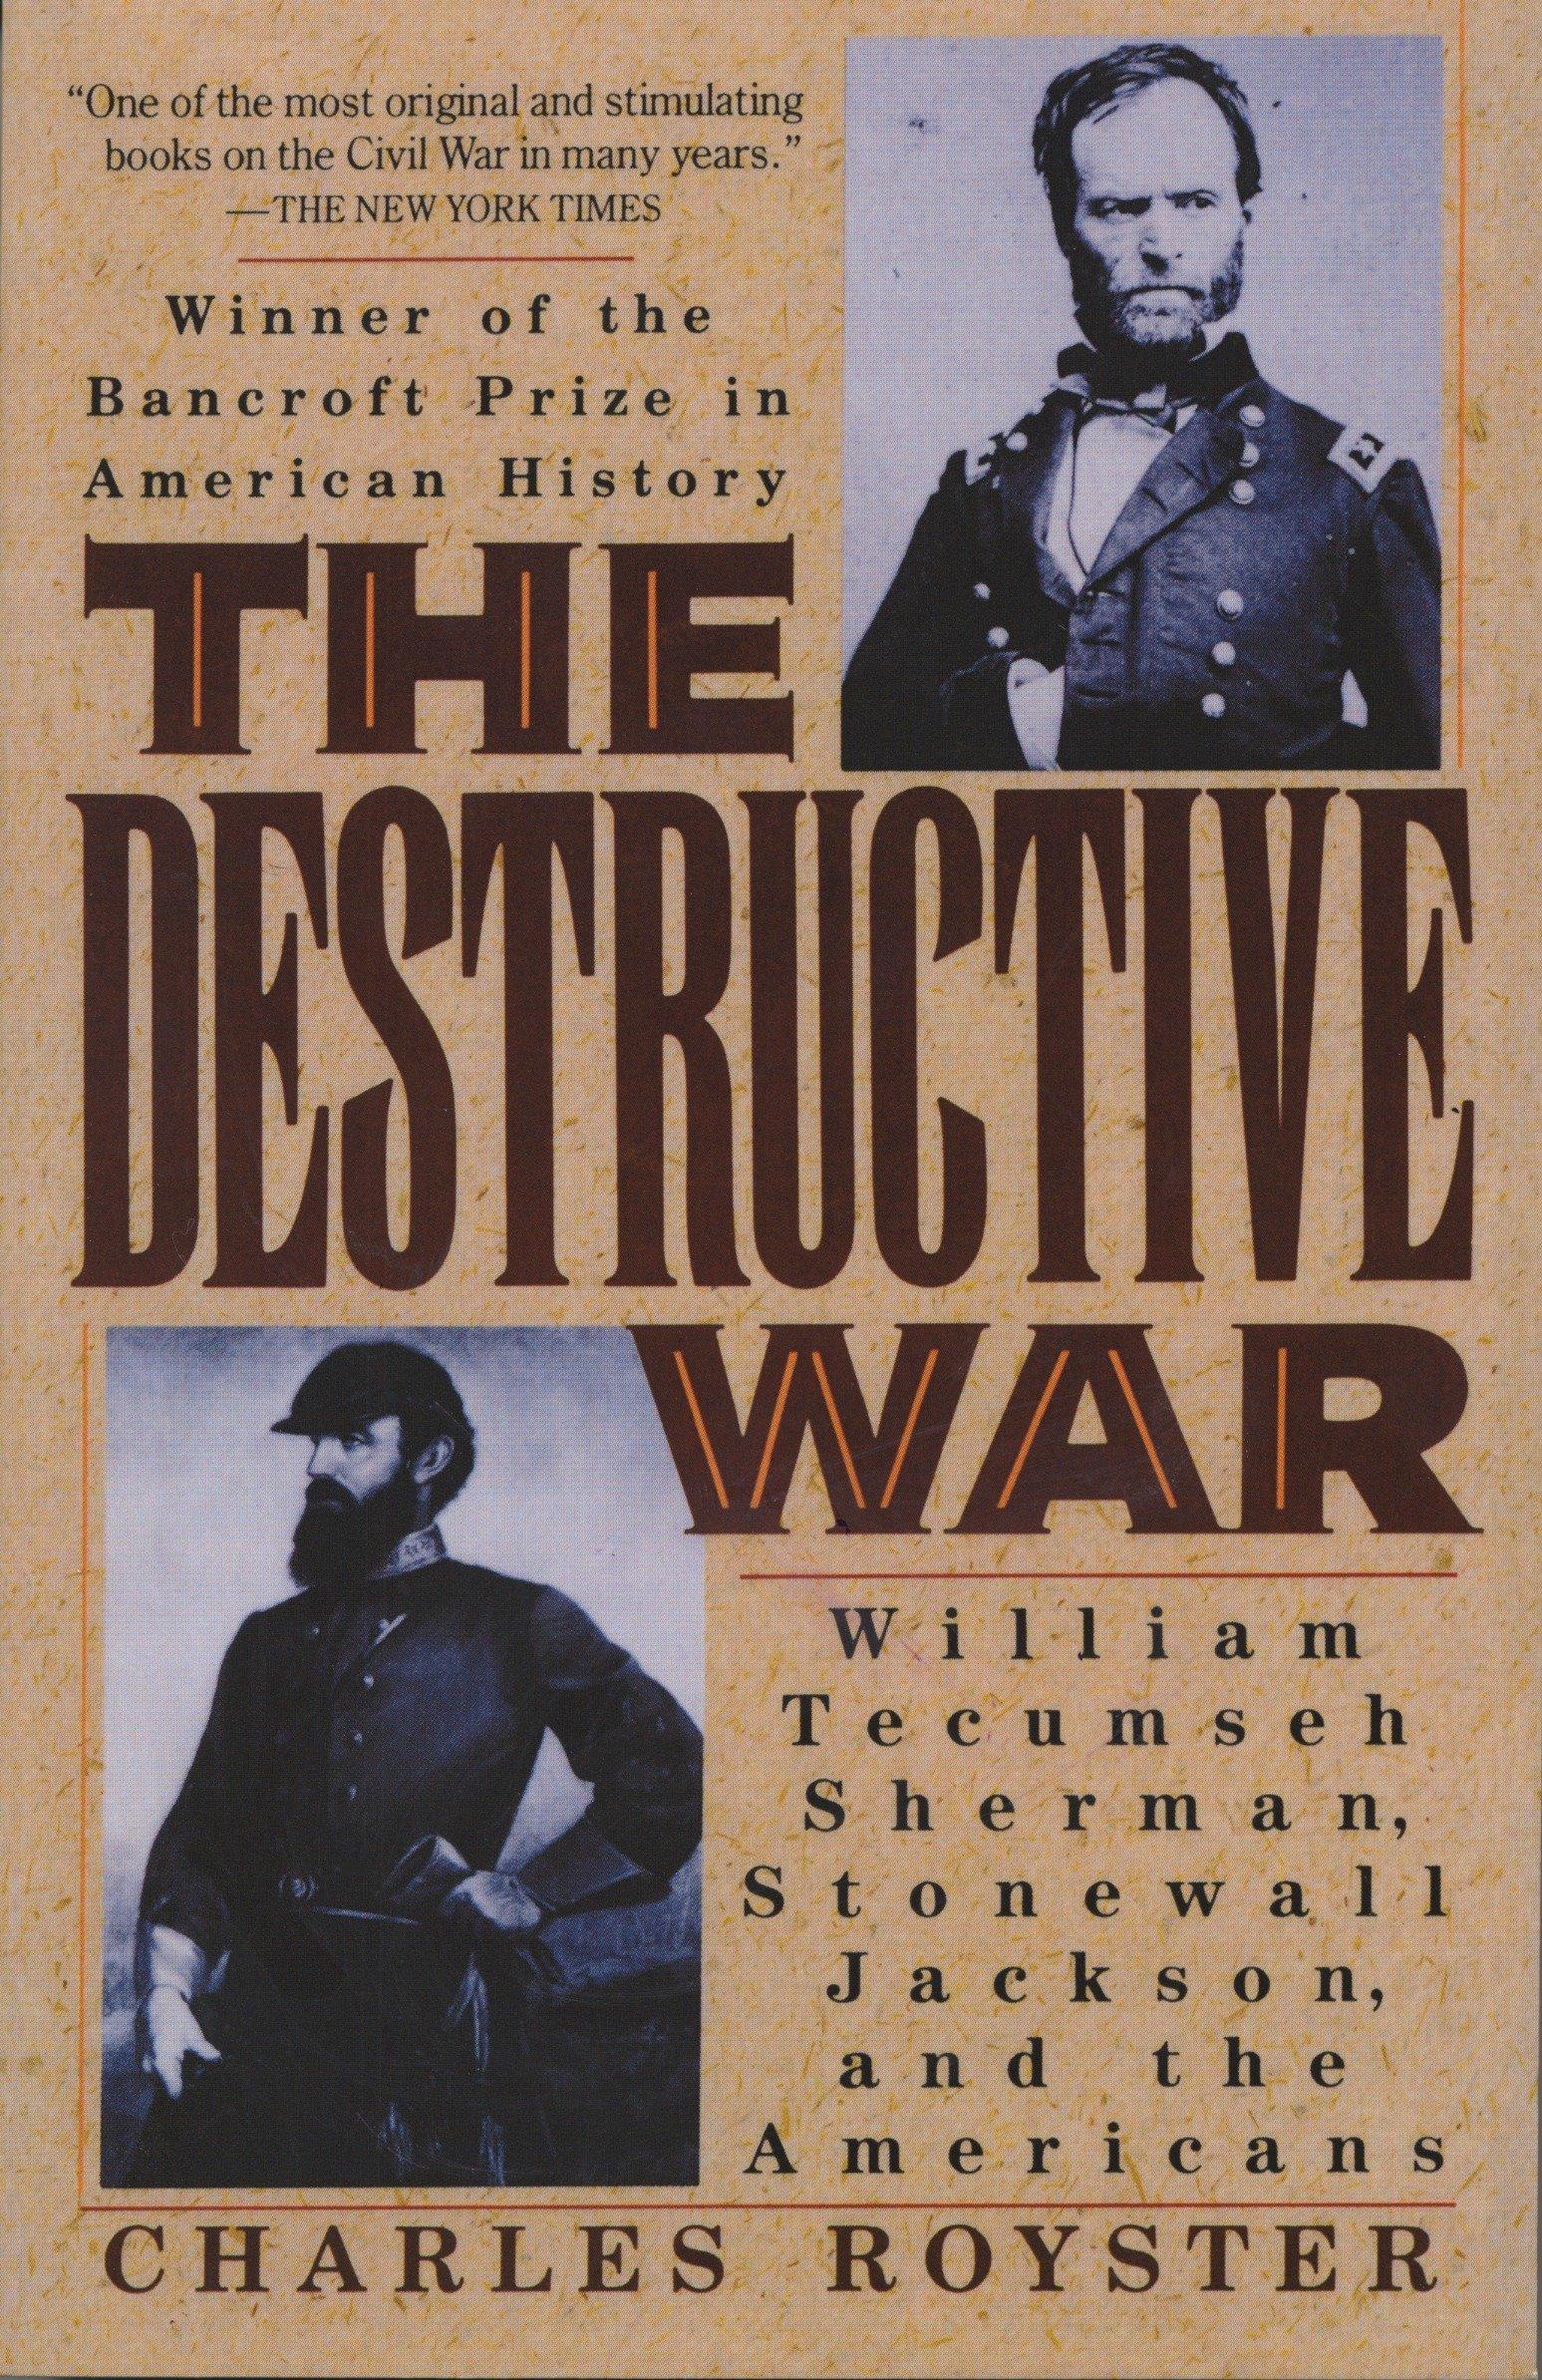 The Destructive War: William Tecumseh Sherman, Stonewall Jackson ...